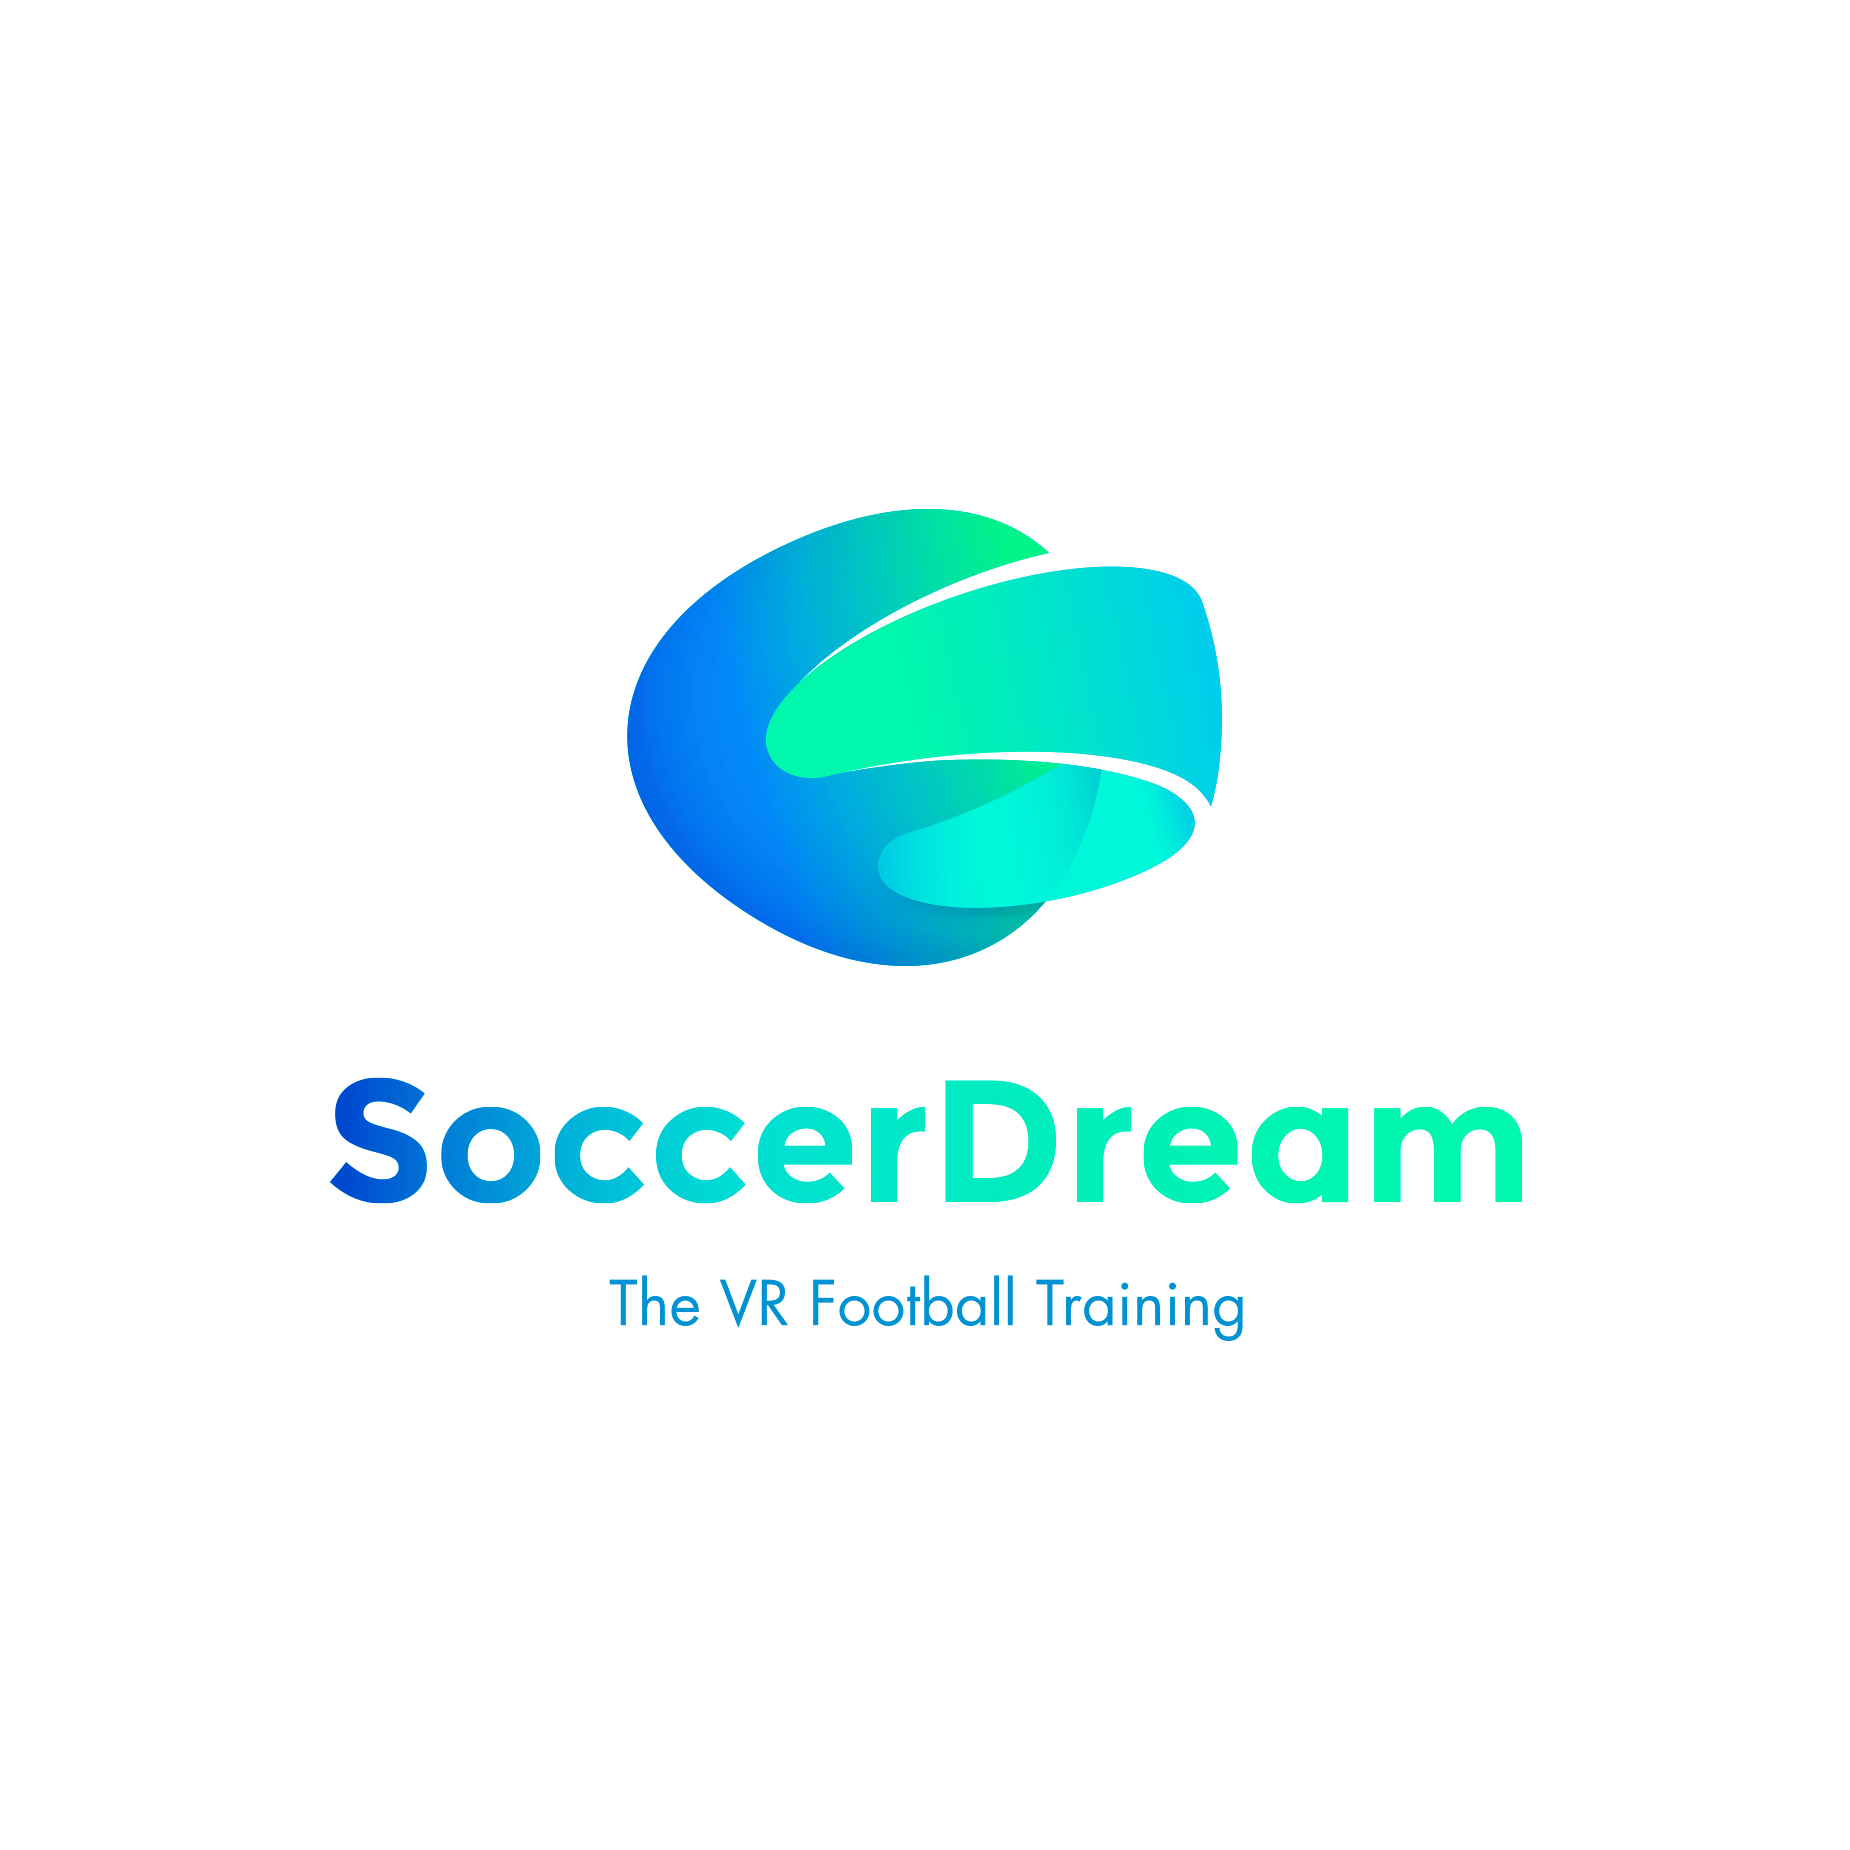 SoccerDream